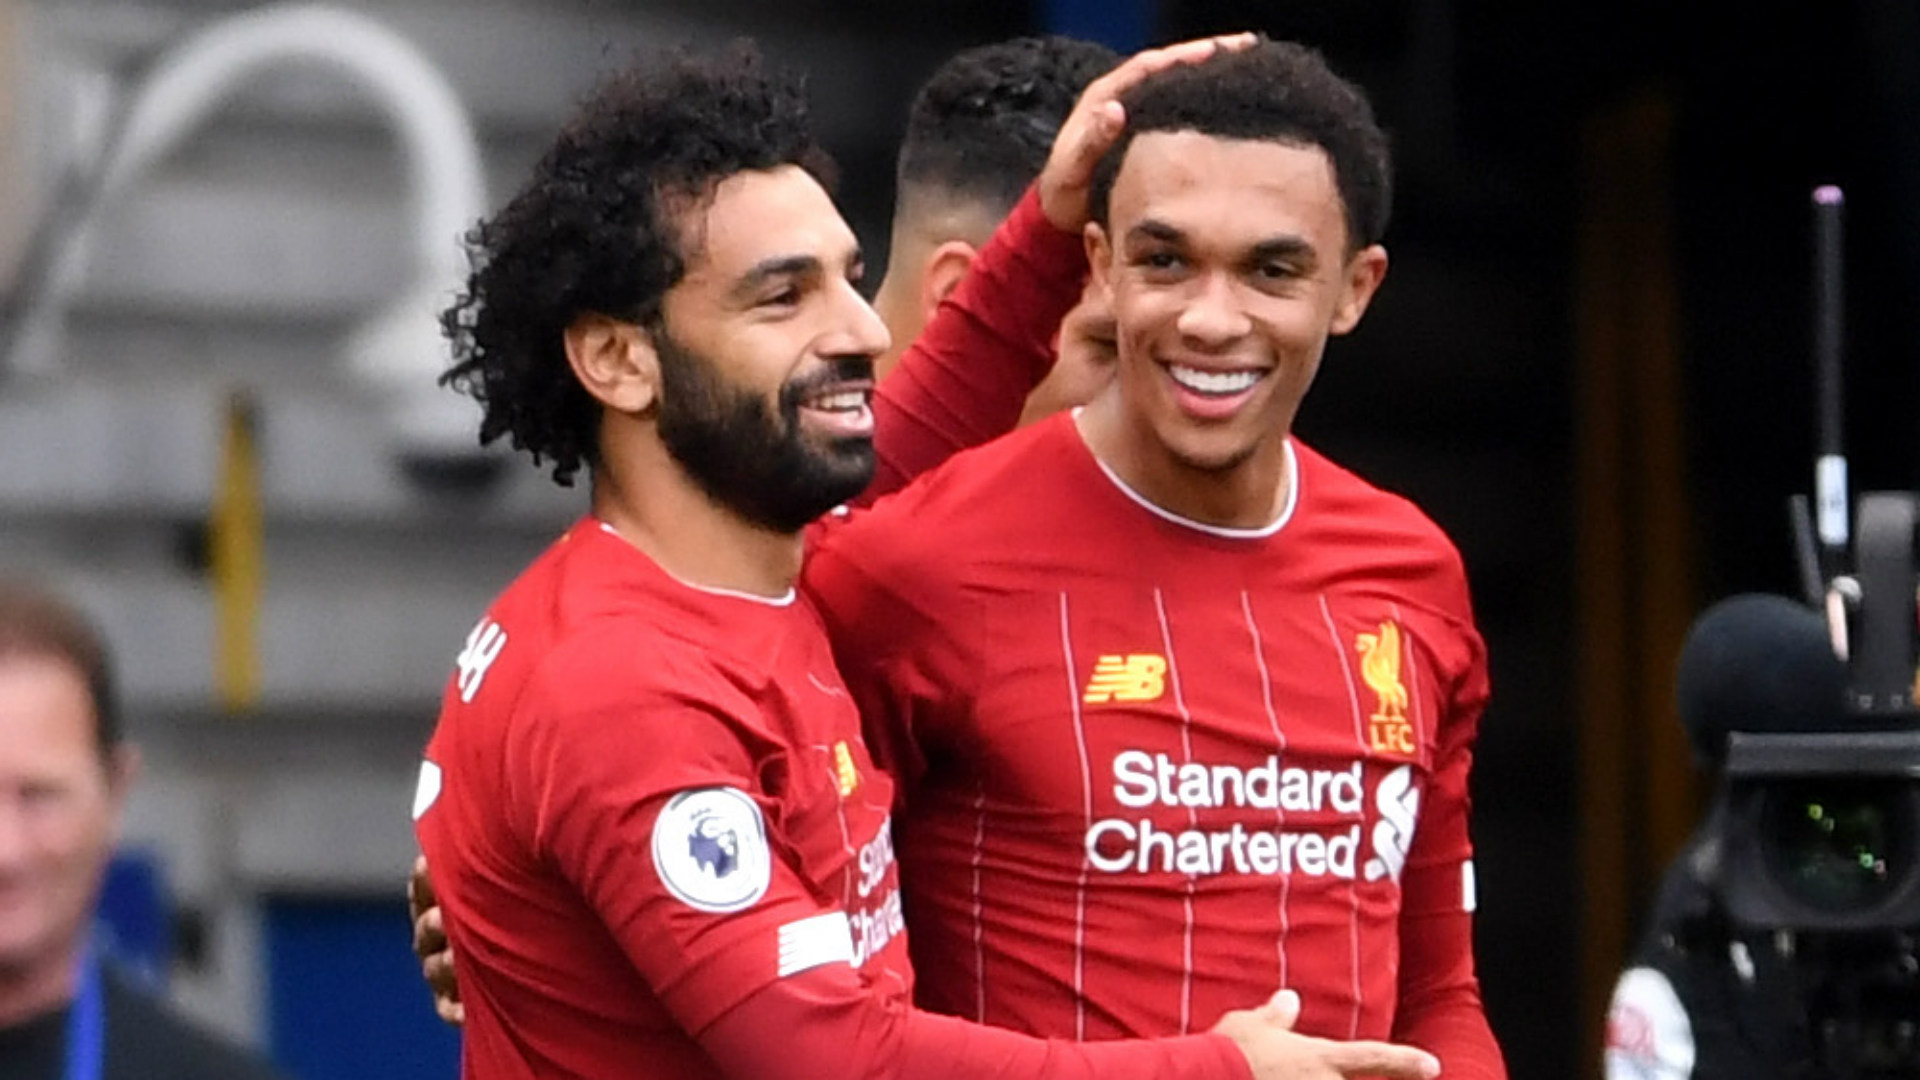 Mohamed Salah Trent Alexander-Arnold Liverpool 2019-20